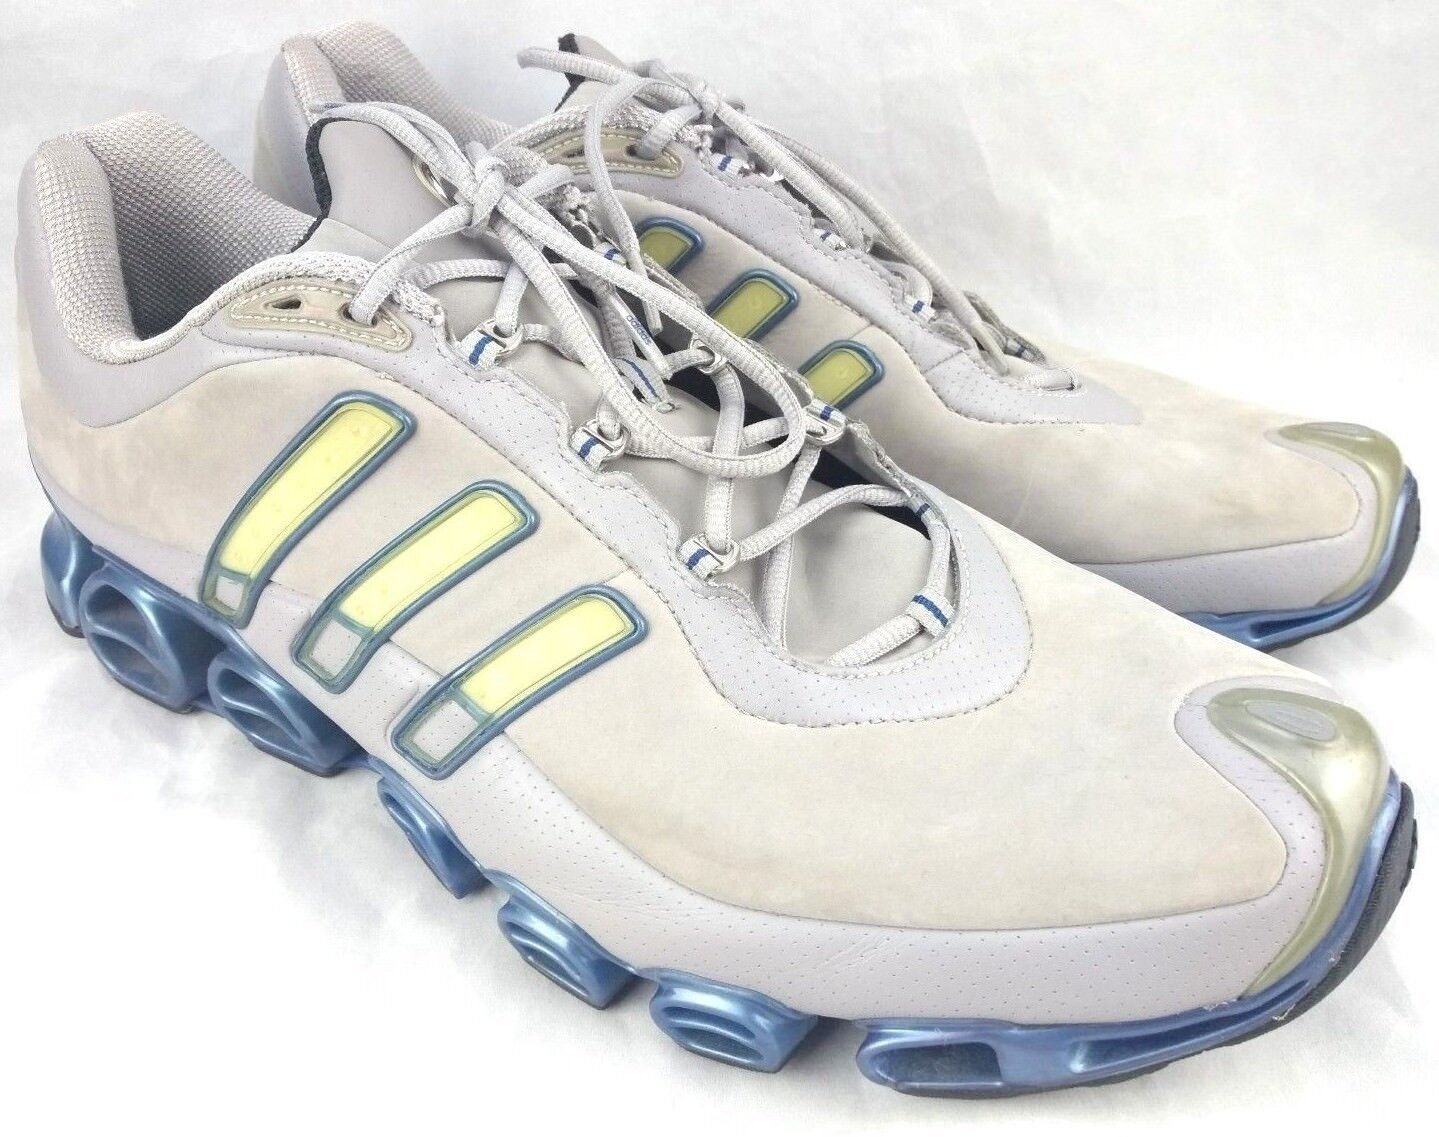 Vtg Adidas A3 Megaride 116368 Men US 18 Eu 53 Running shoes Sneaker 121-5